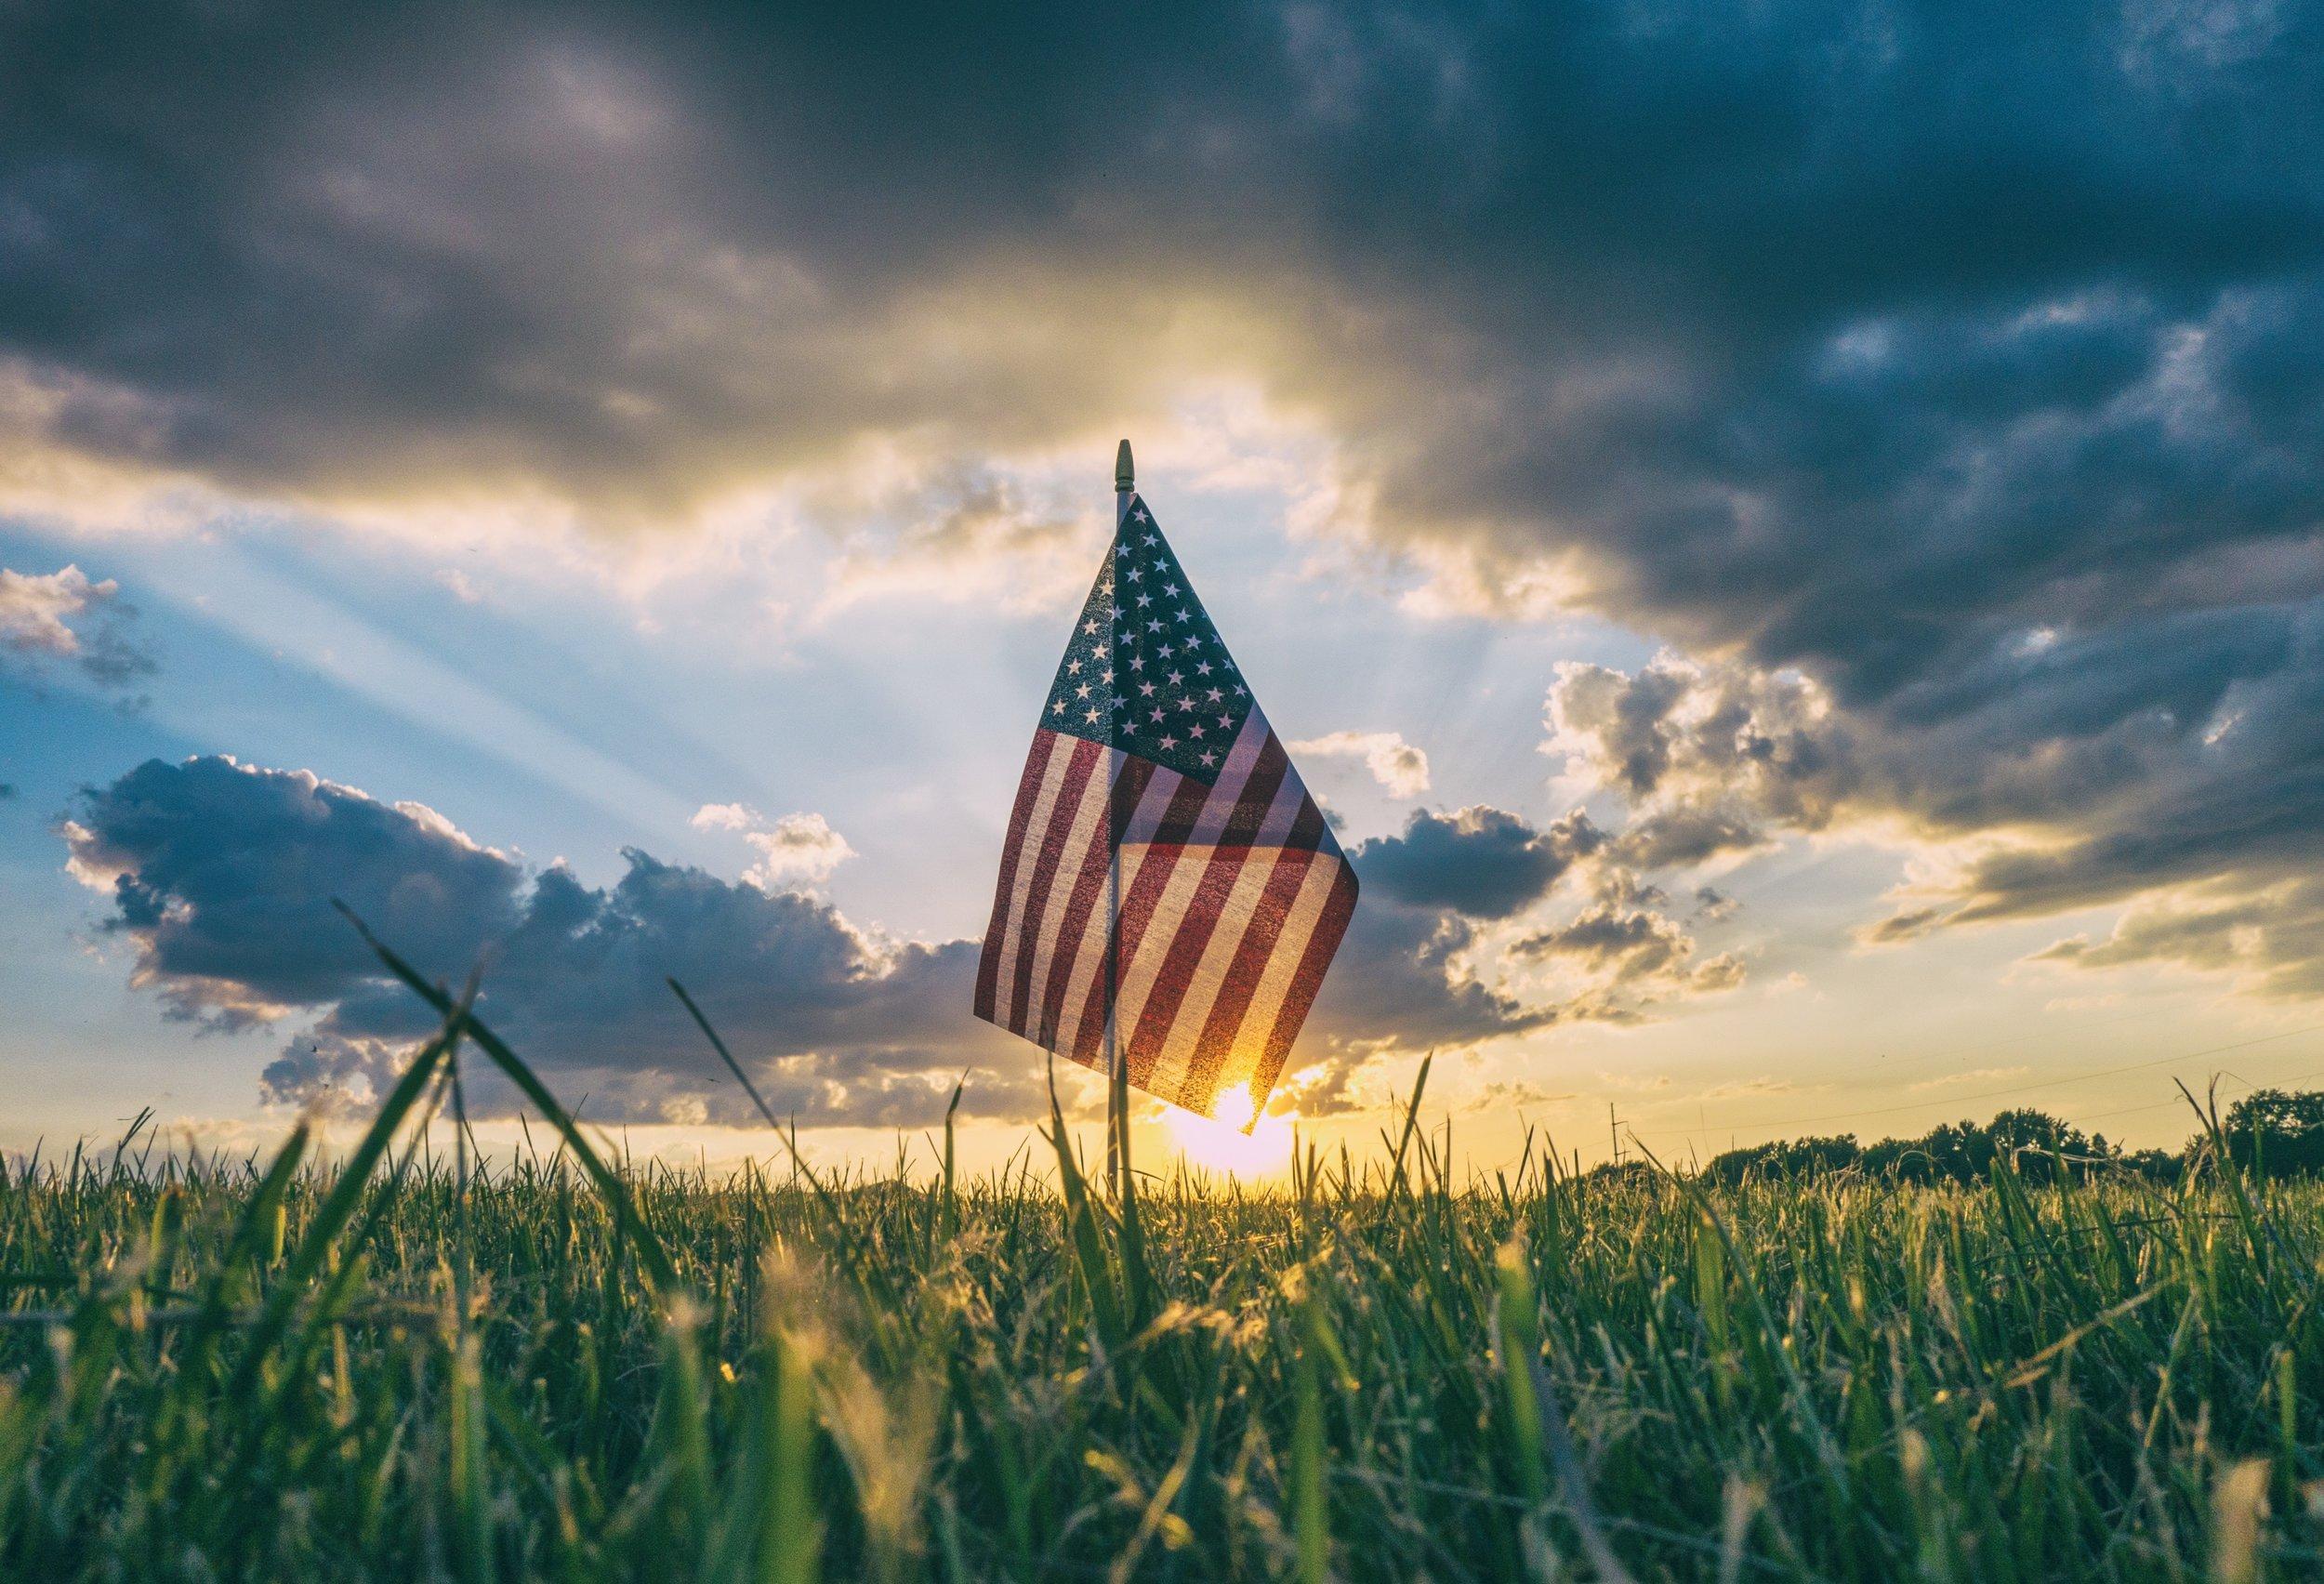 American Flag in a grassy field